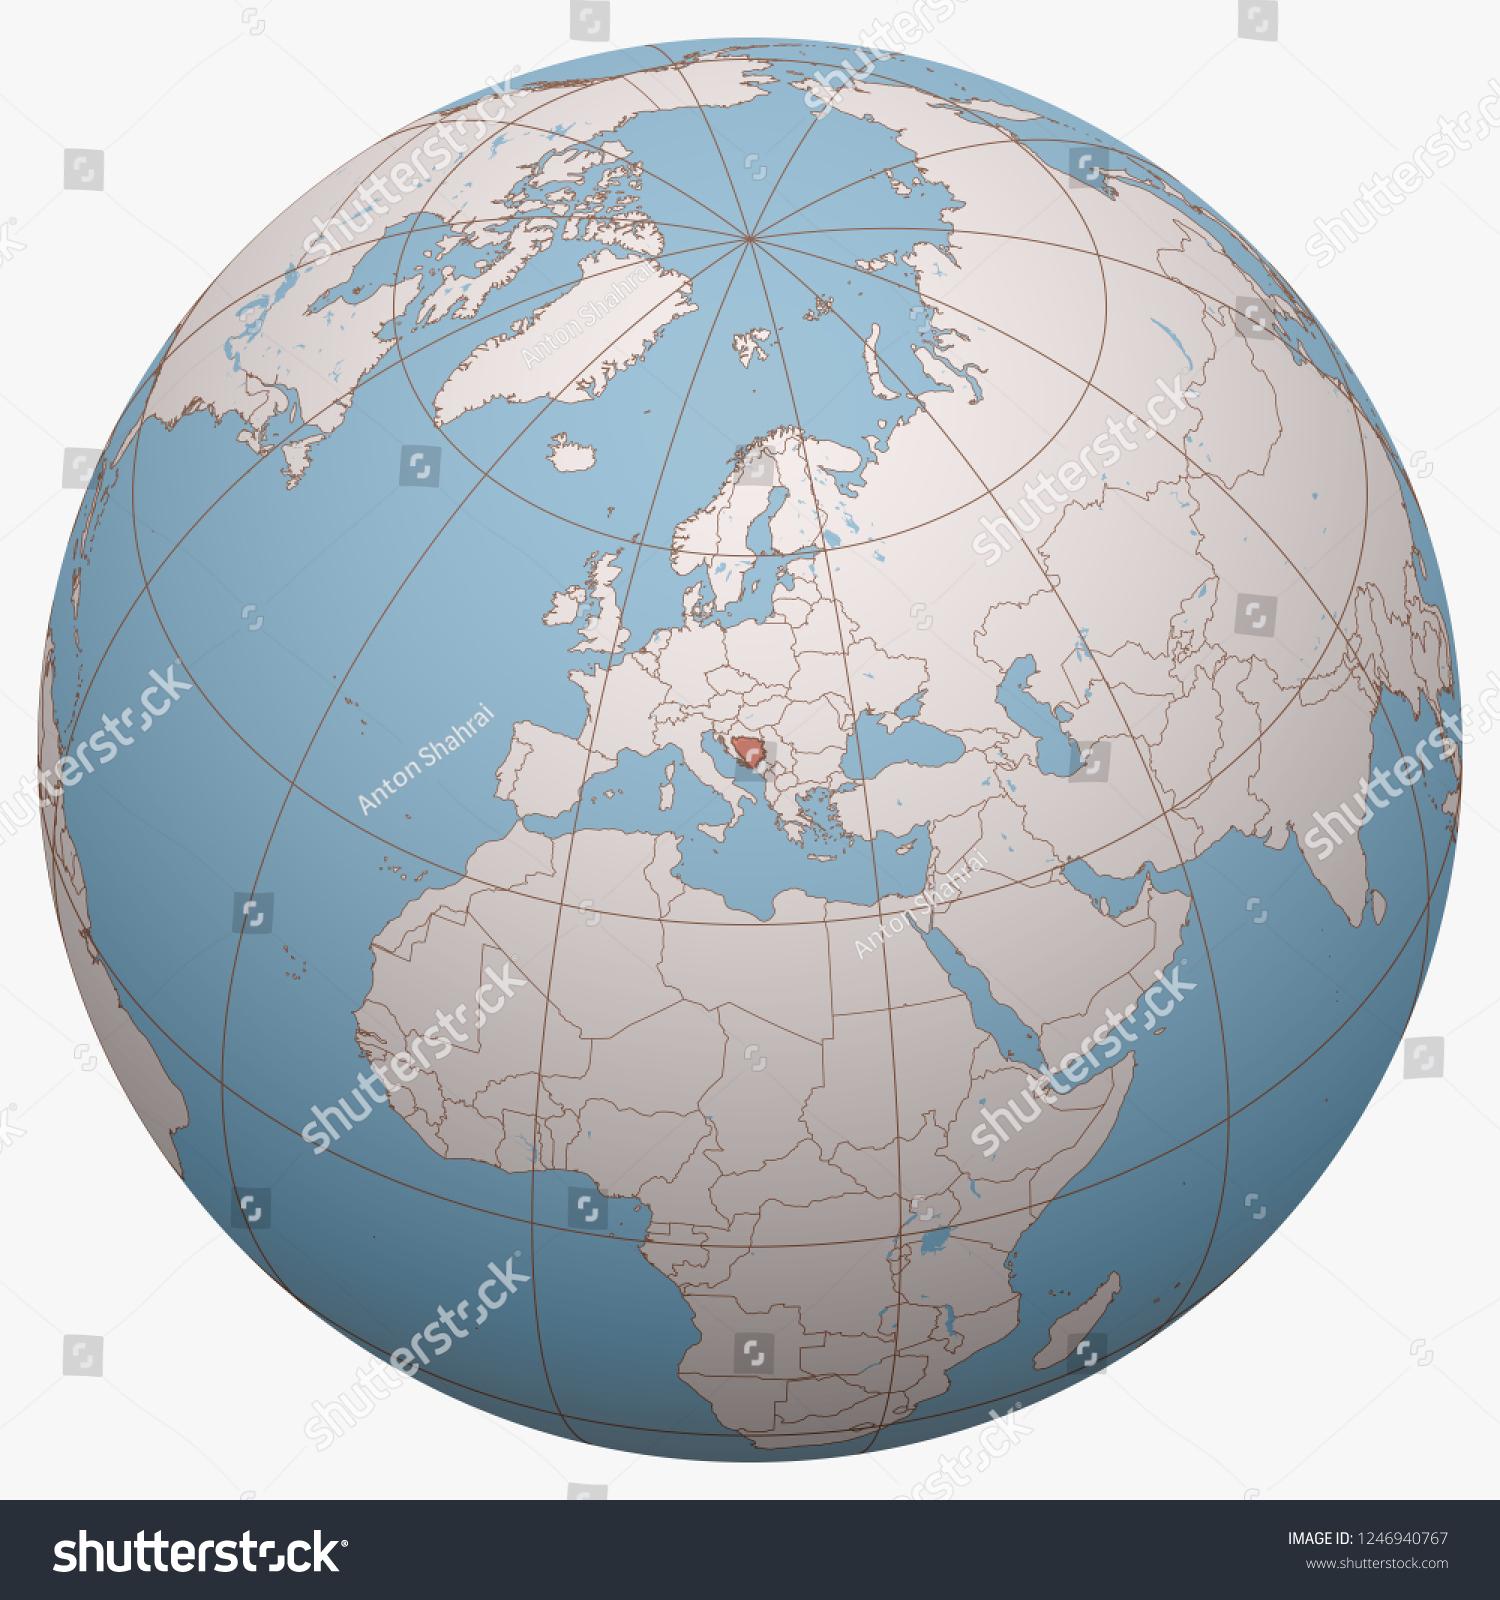 Picture of: Bosnia Herzegovina Bh Bih On Globe Stock Vector Royalty Free 1246940767